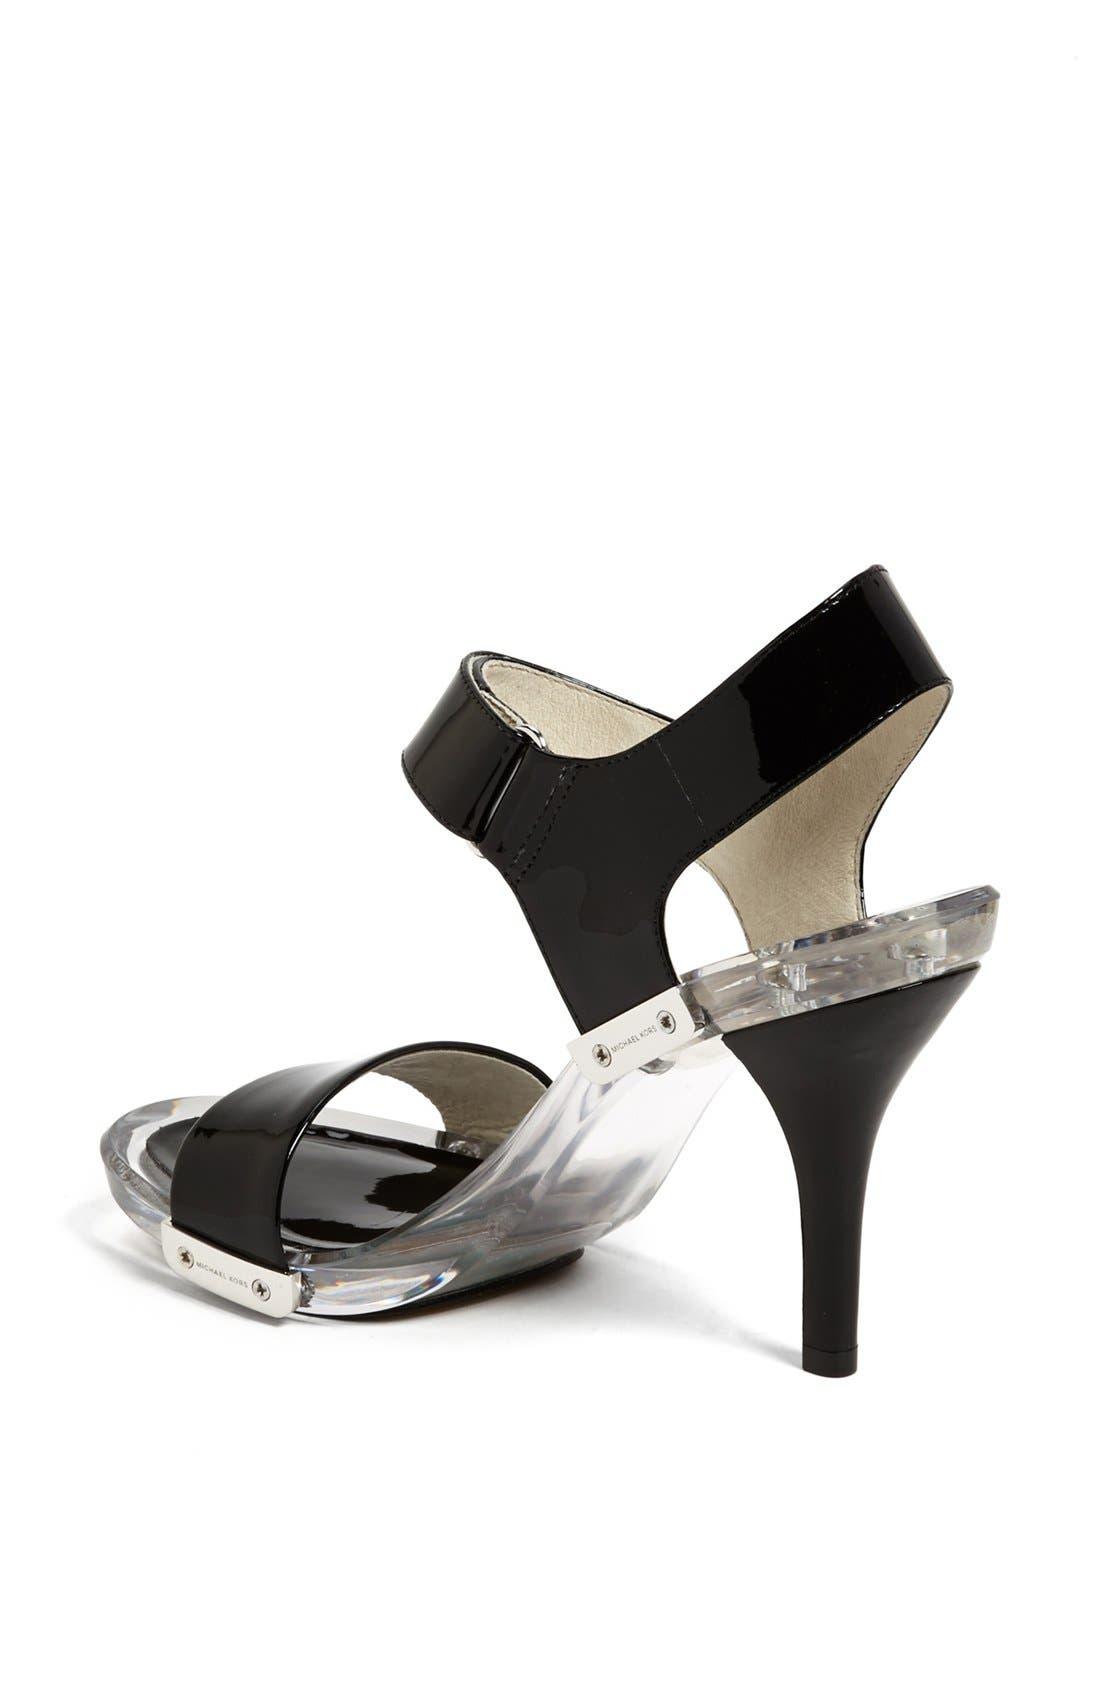 Alternate Image 2  - MICHAEL Michael Kors 'Lani' Patent Leather Sandal